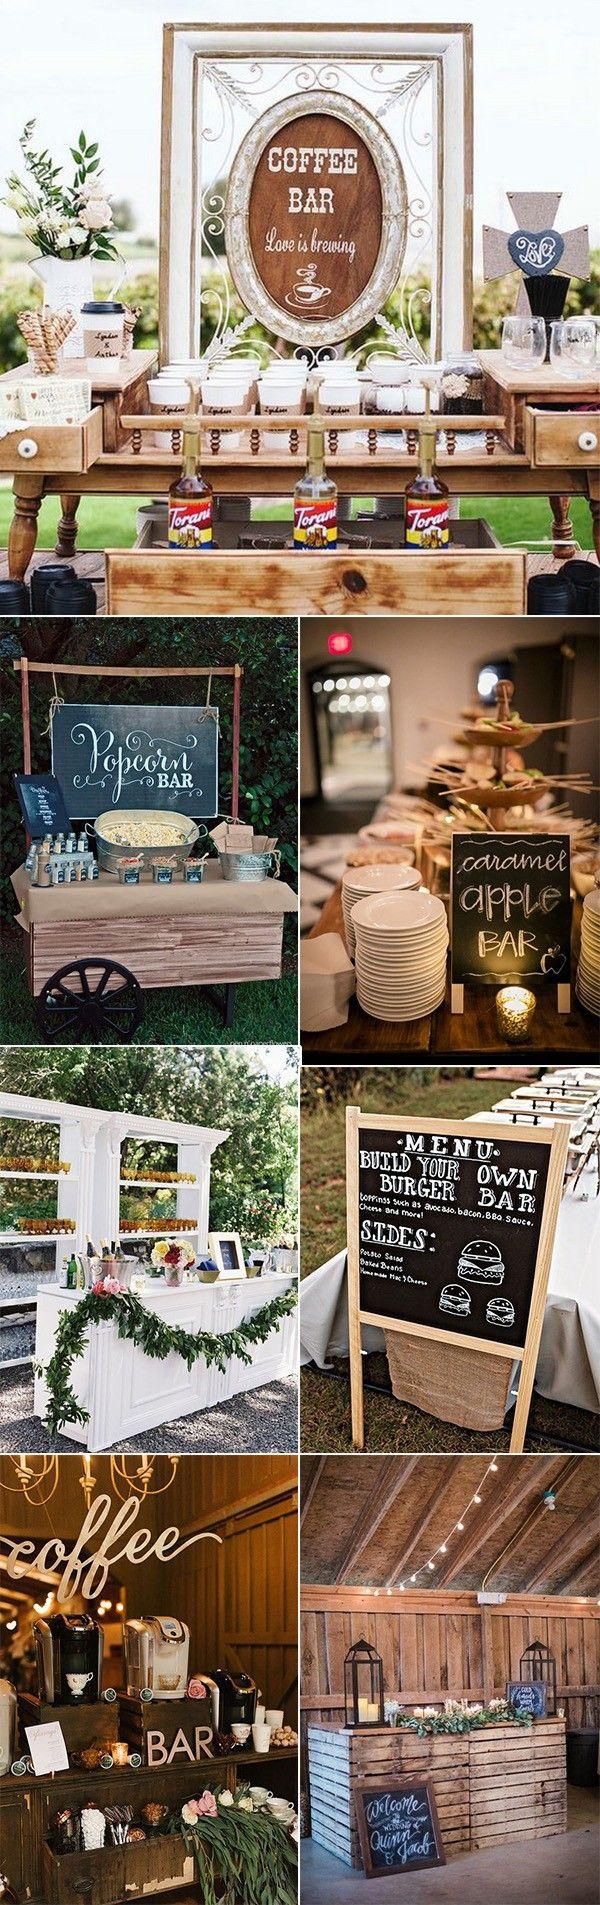 trending wedding reception bar ideas for 2018 #weddingreception #weddingideas #weddingfood #weddingdrinks #weddingdecor